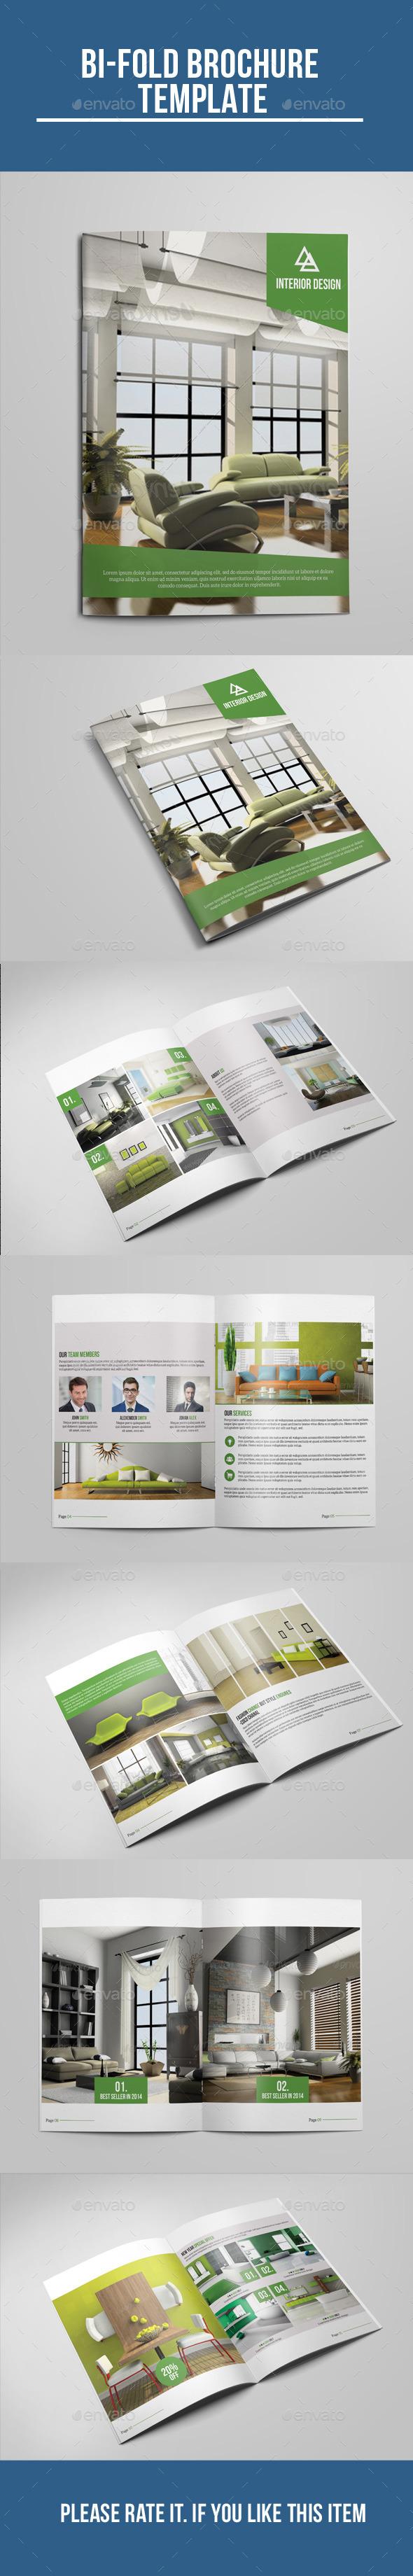 Interior Bi-Fold Brochure - Corporate Brochures